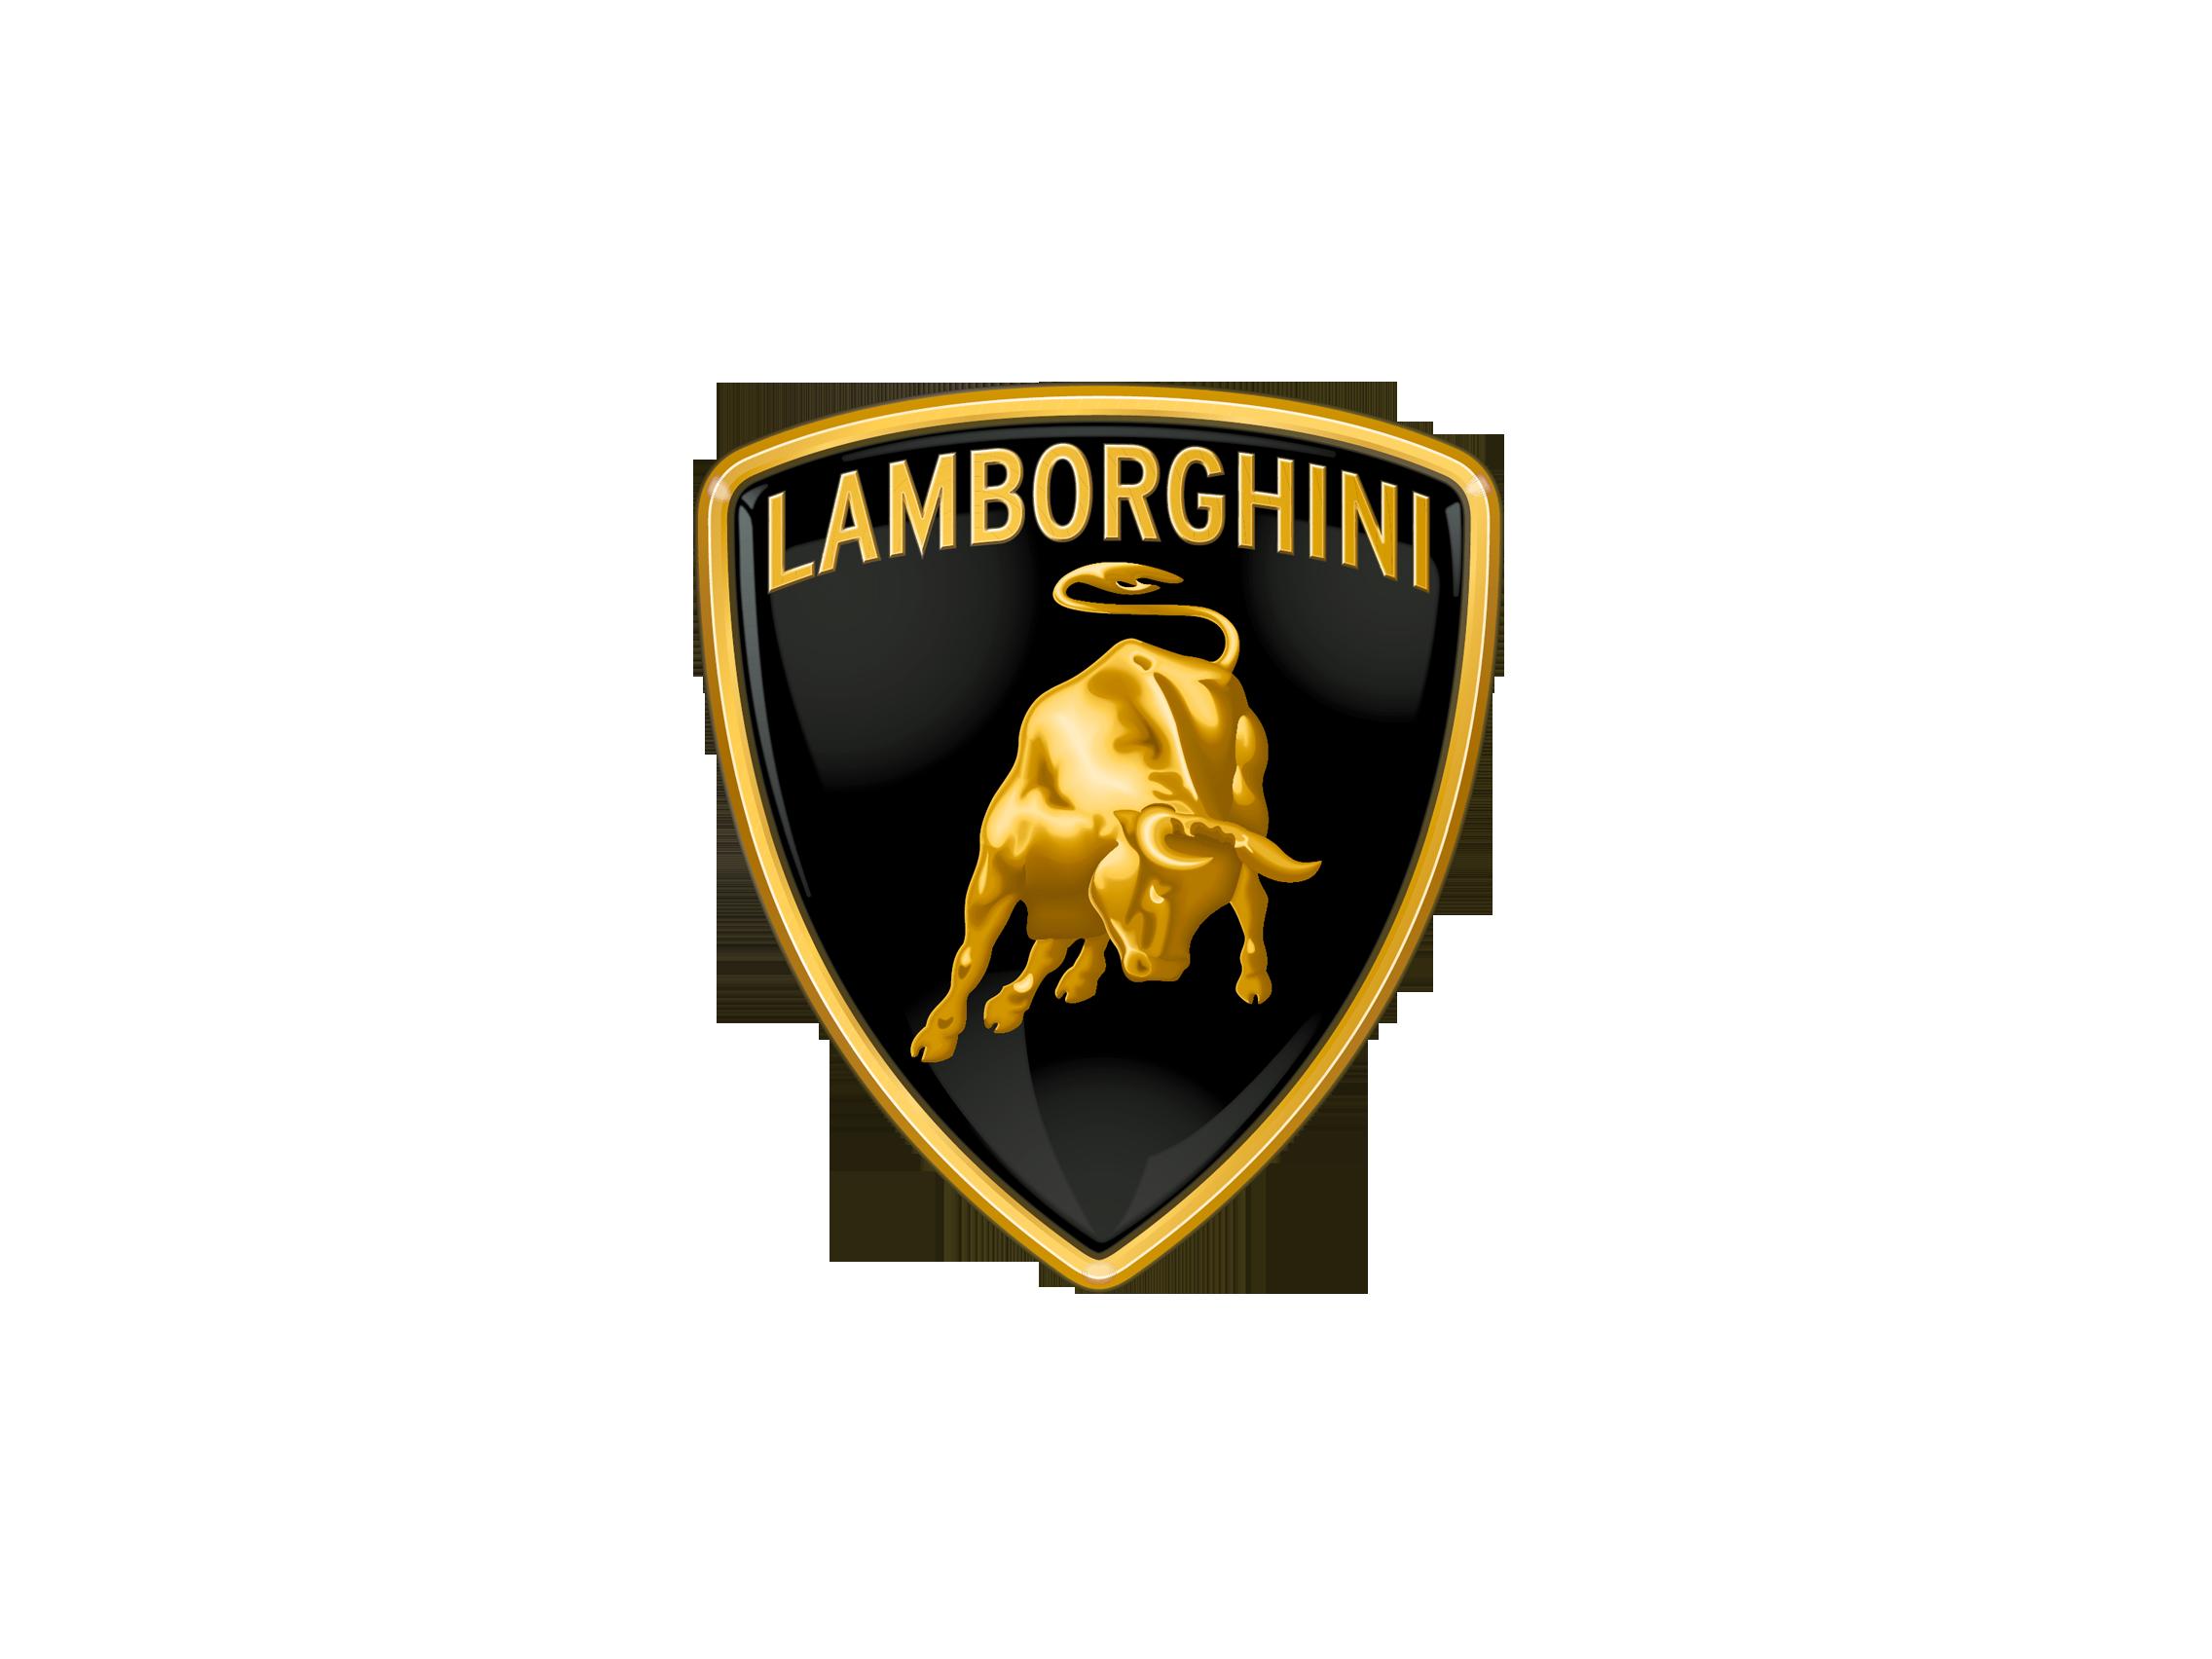 Lamborghini Logo, Transparent Lamborghini Car Symbol Png.